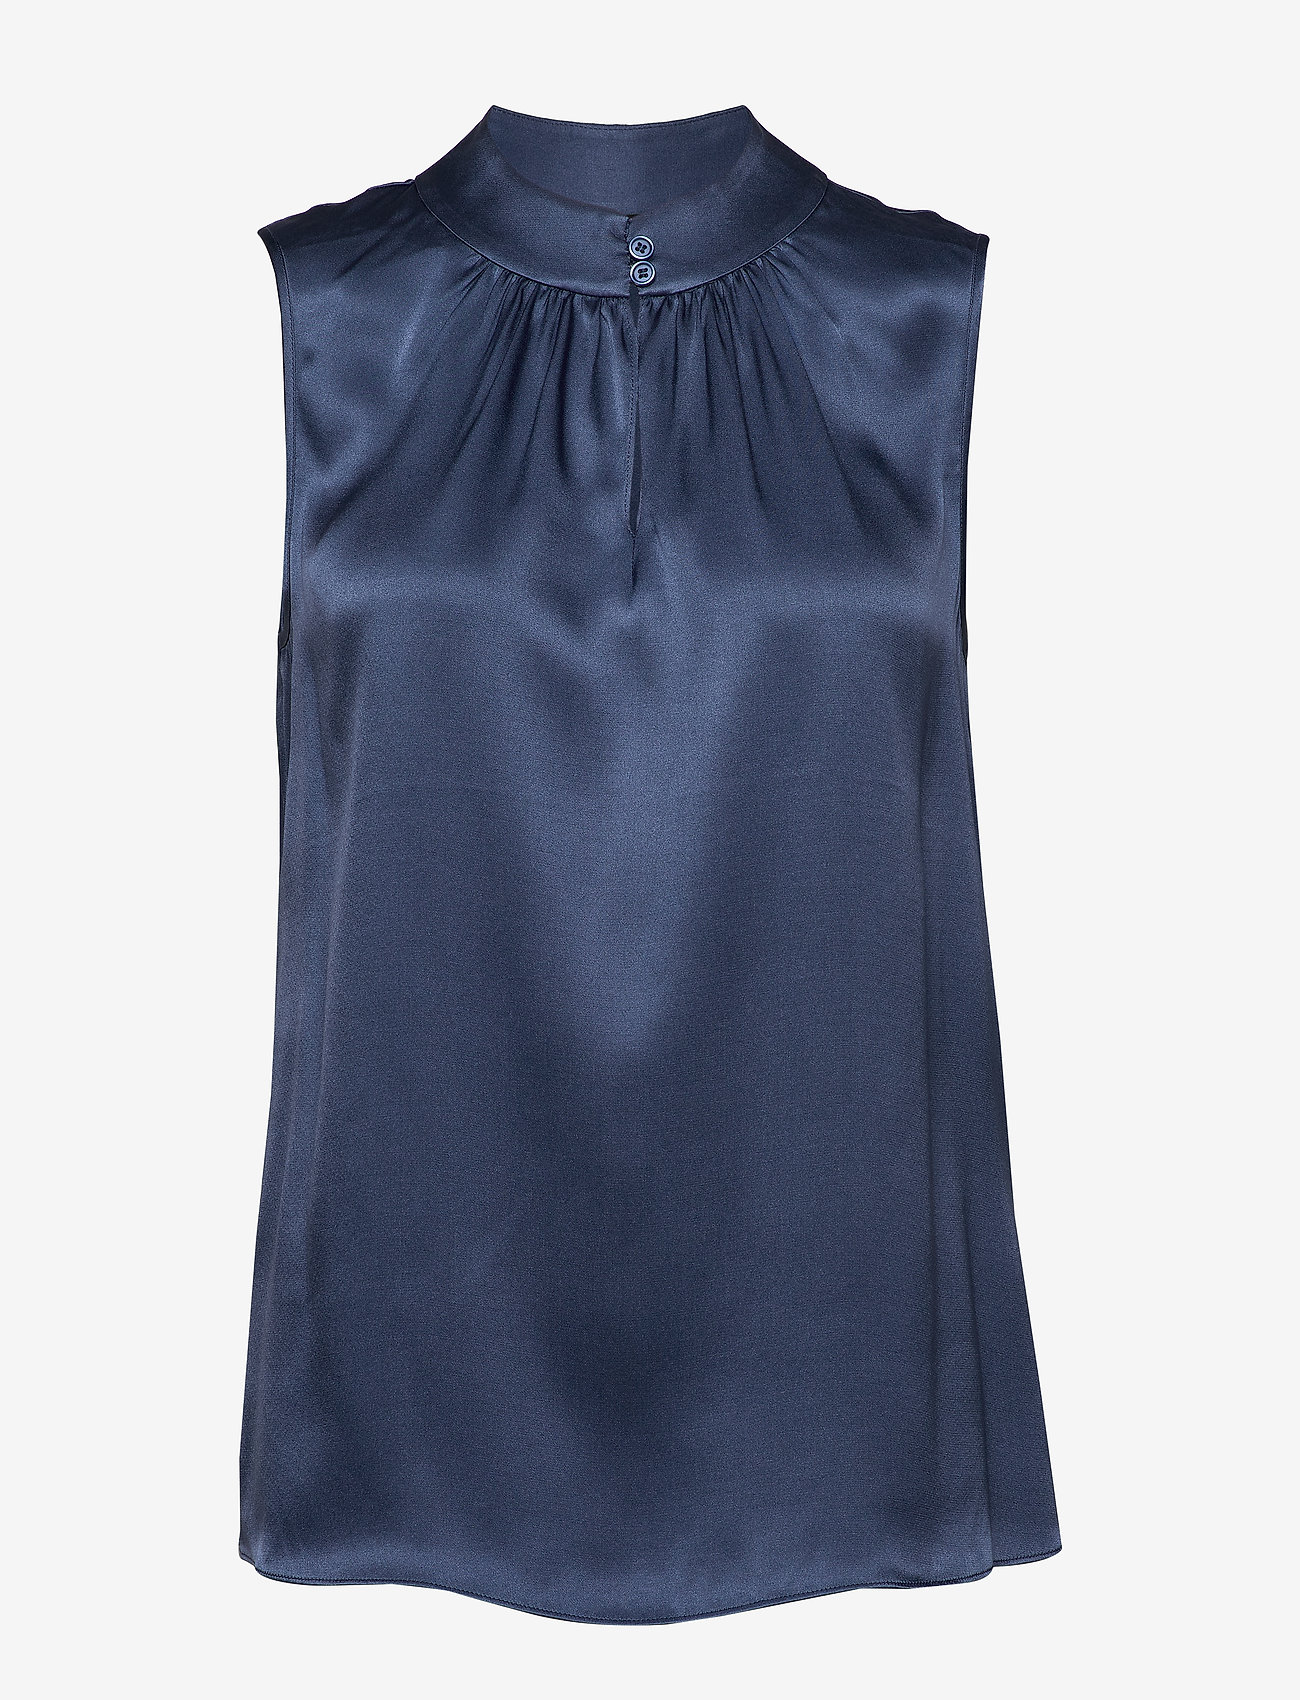 SAND - Double Silk - Prosi Top - blouses zonder mouwen - medium blue - 0